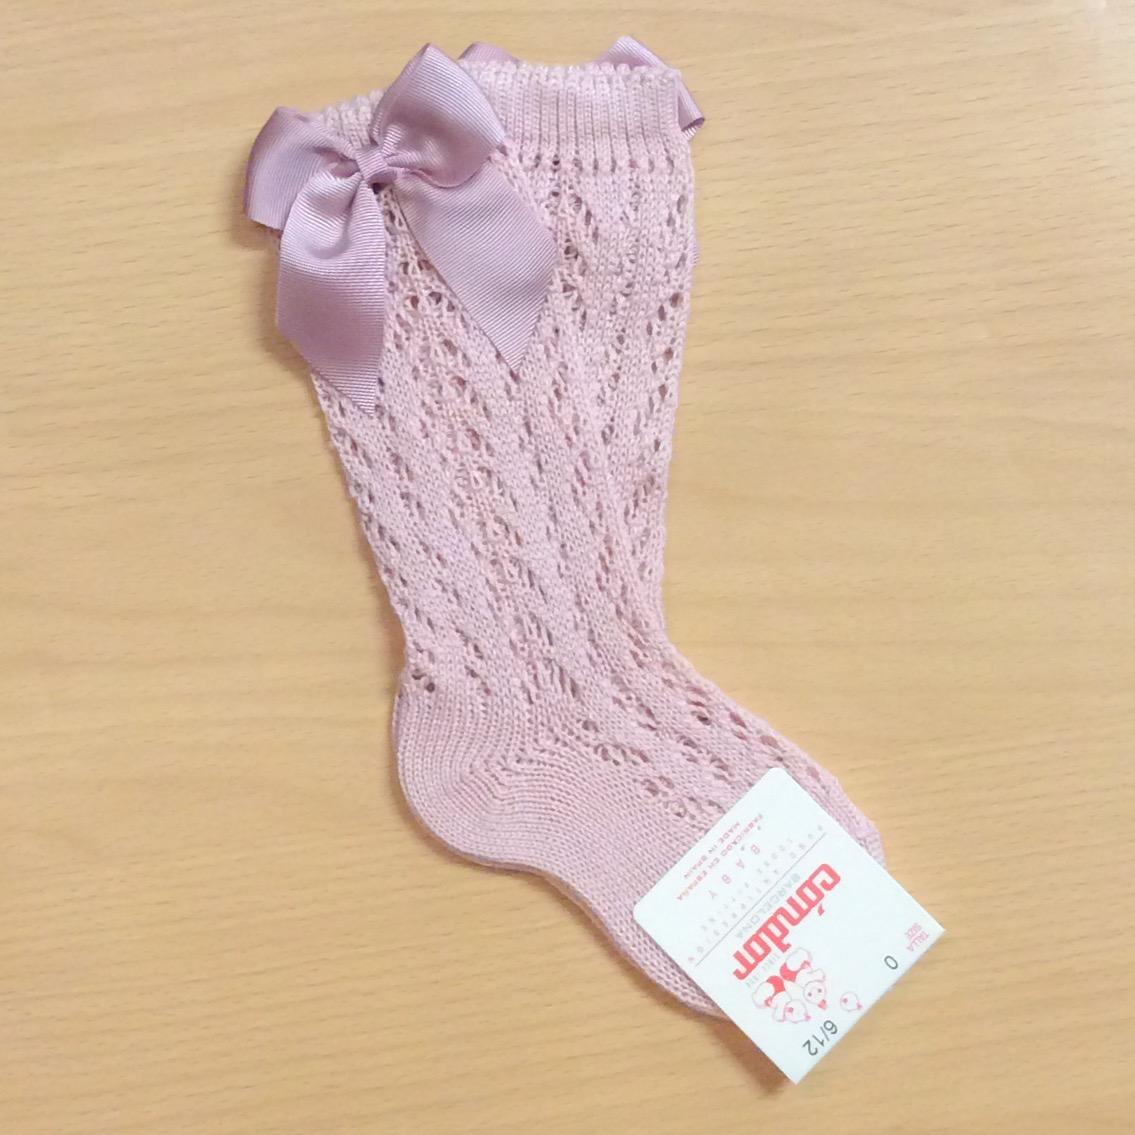 Condor Perle Open Work Knee Socks, Dusky Pink